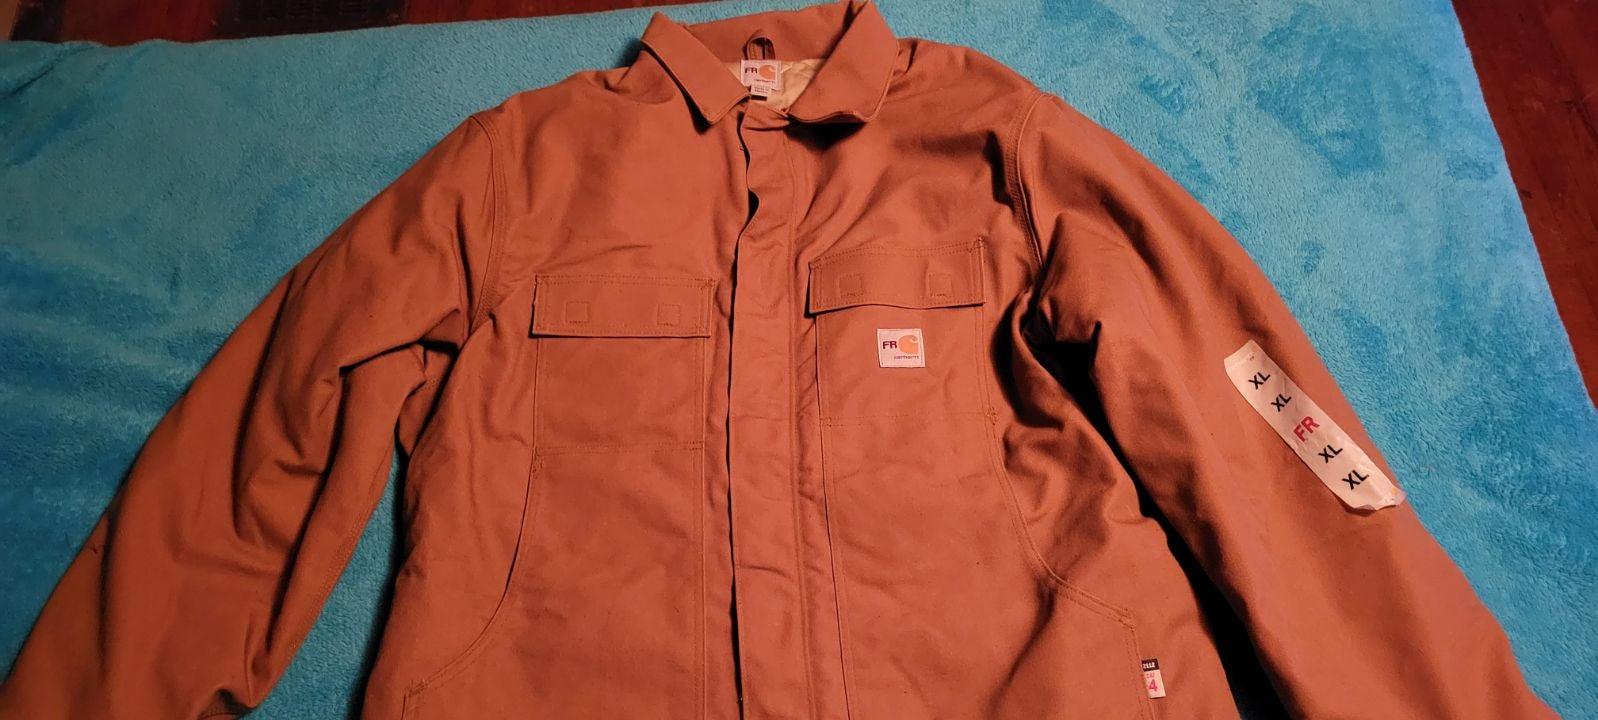 Carhartt Jacket Flame resistant xl NWT